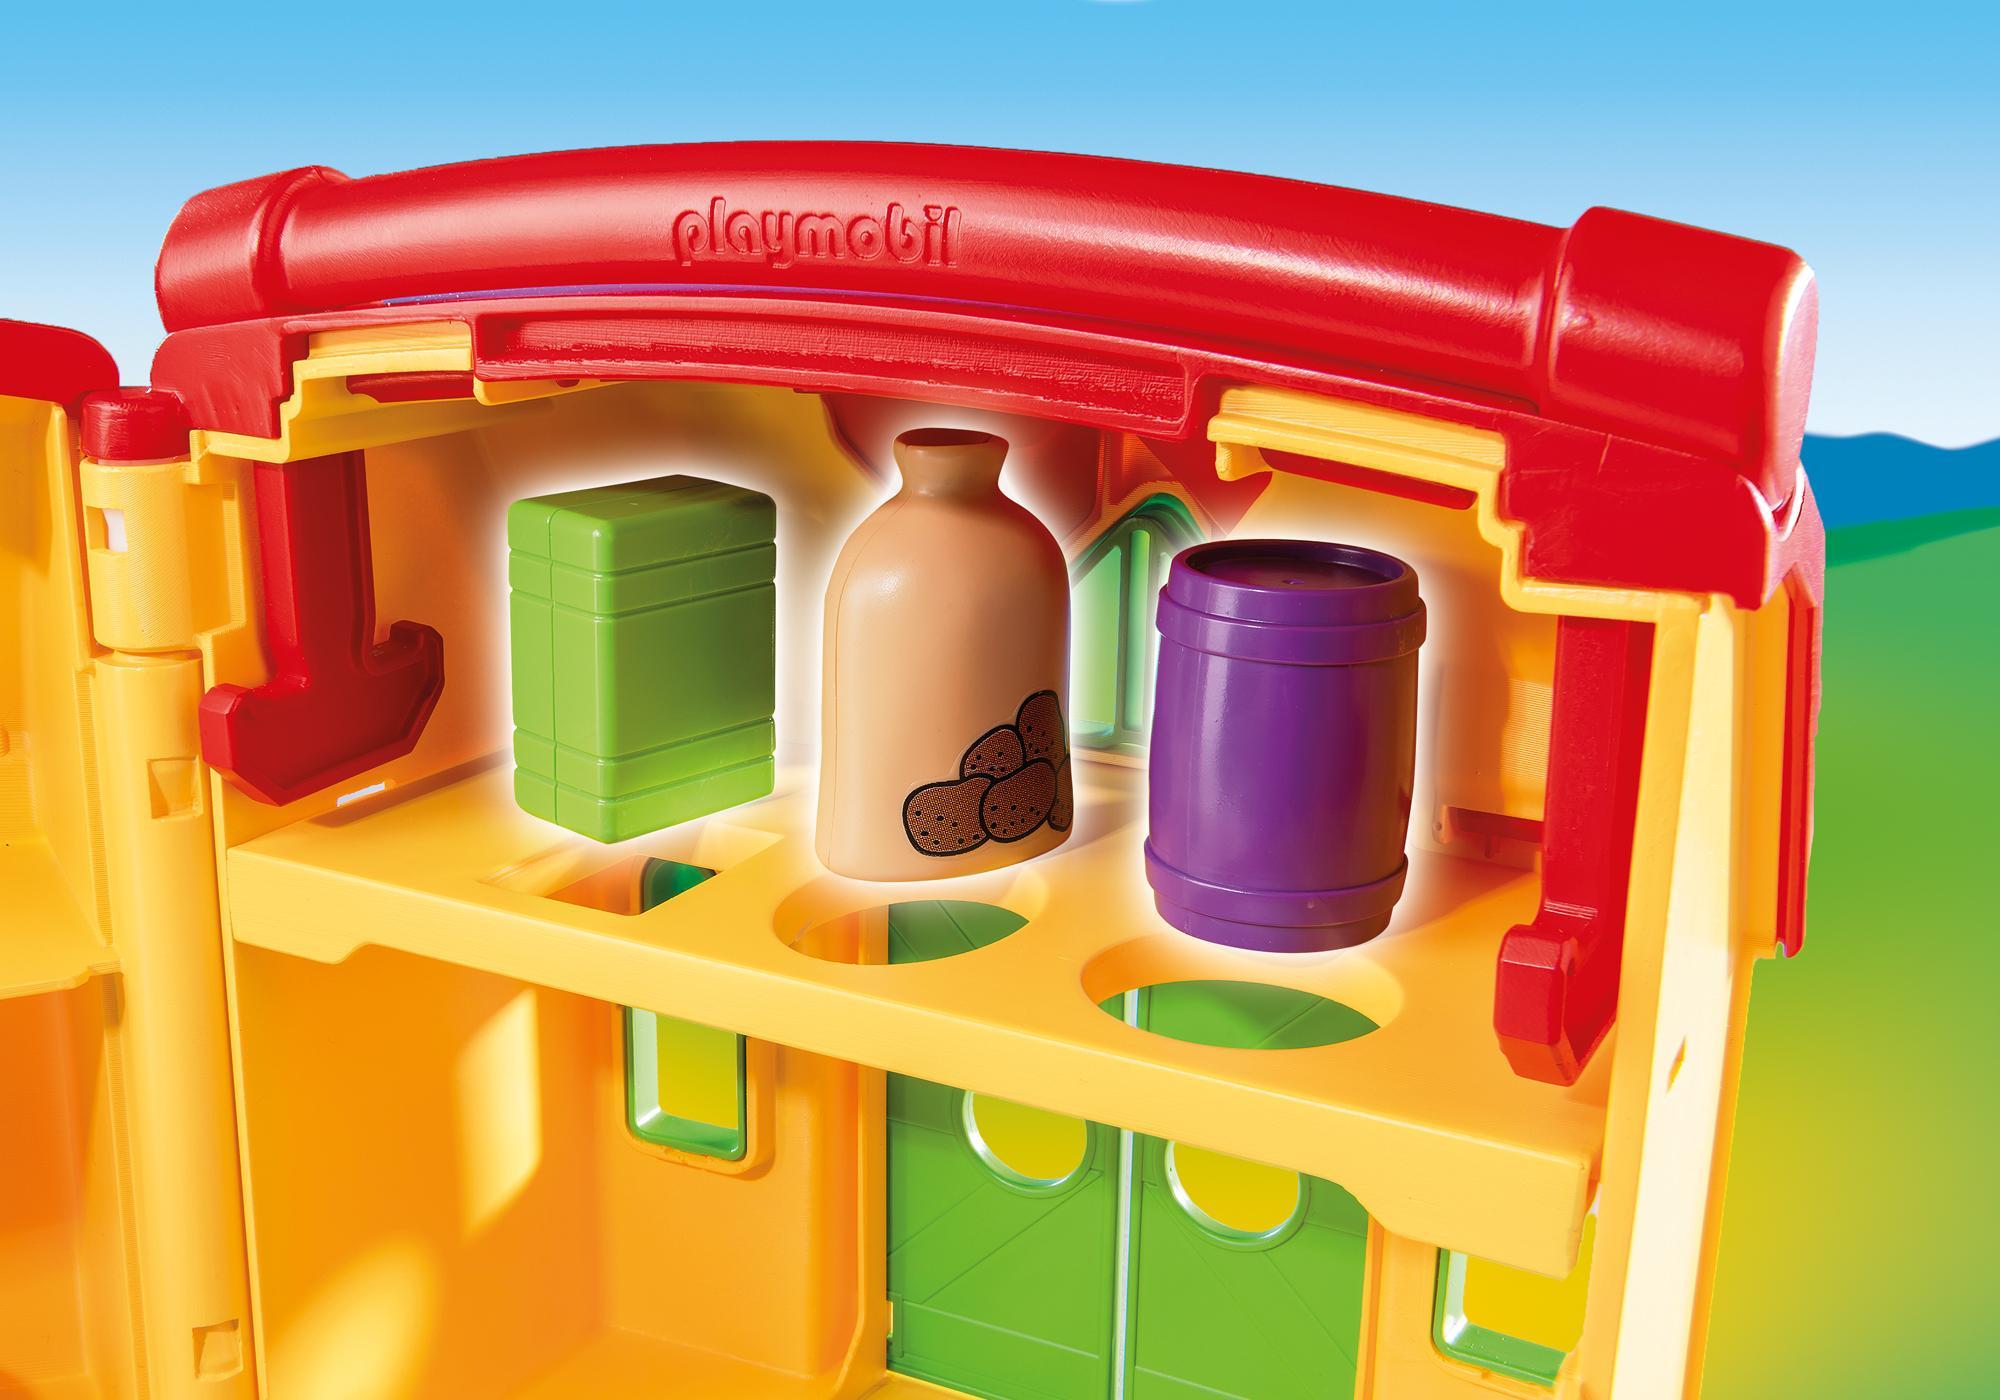 http://media.playmobil.com/i/playmobil/6962_product_extra1/1.2.3 Quinta Maleta